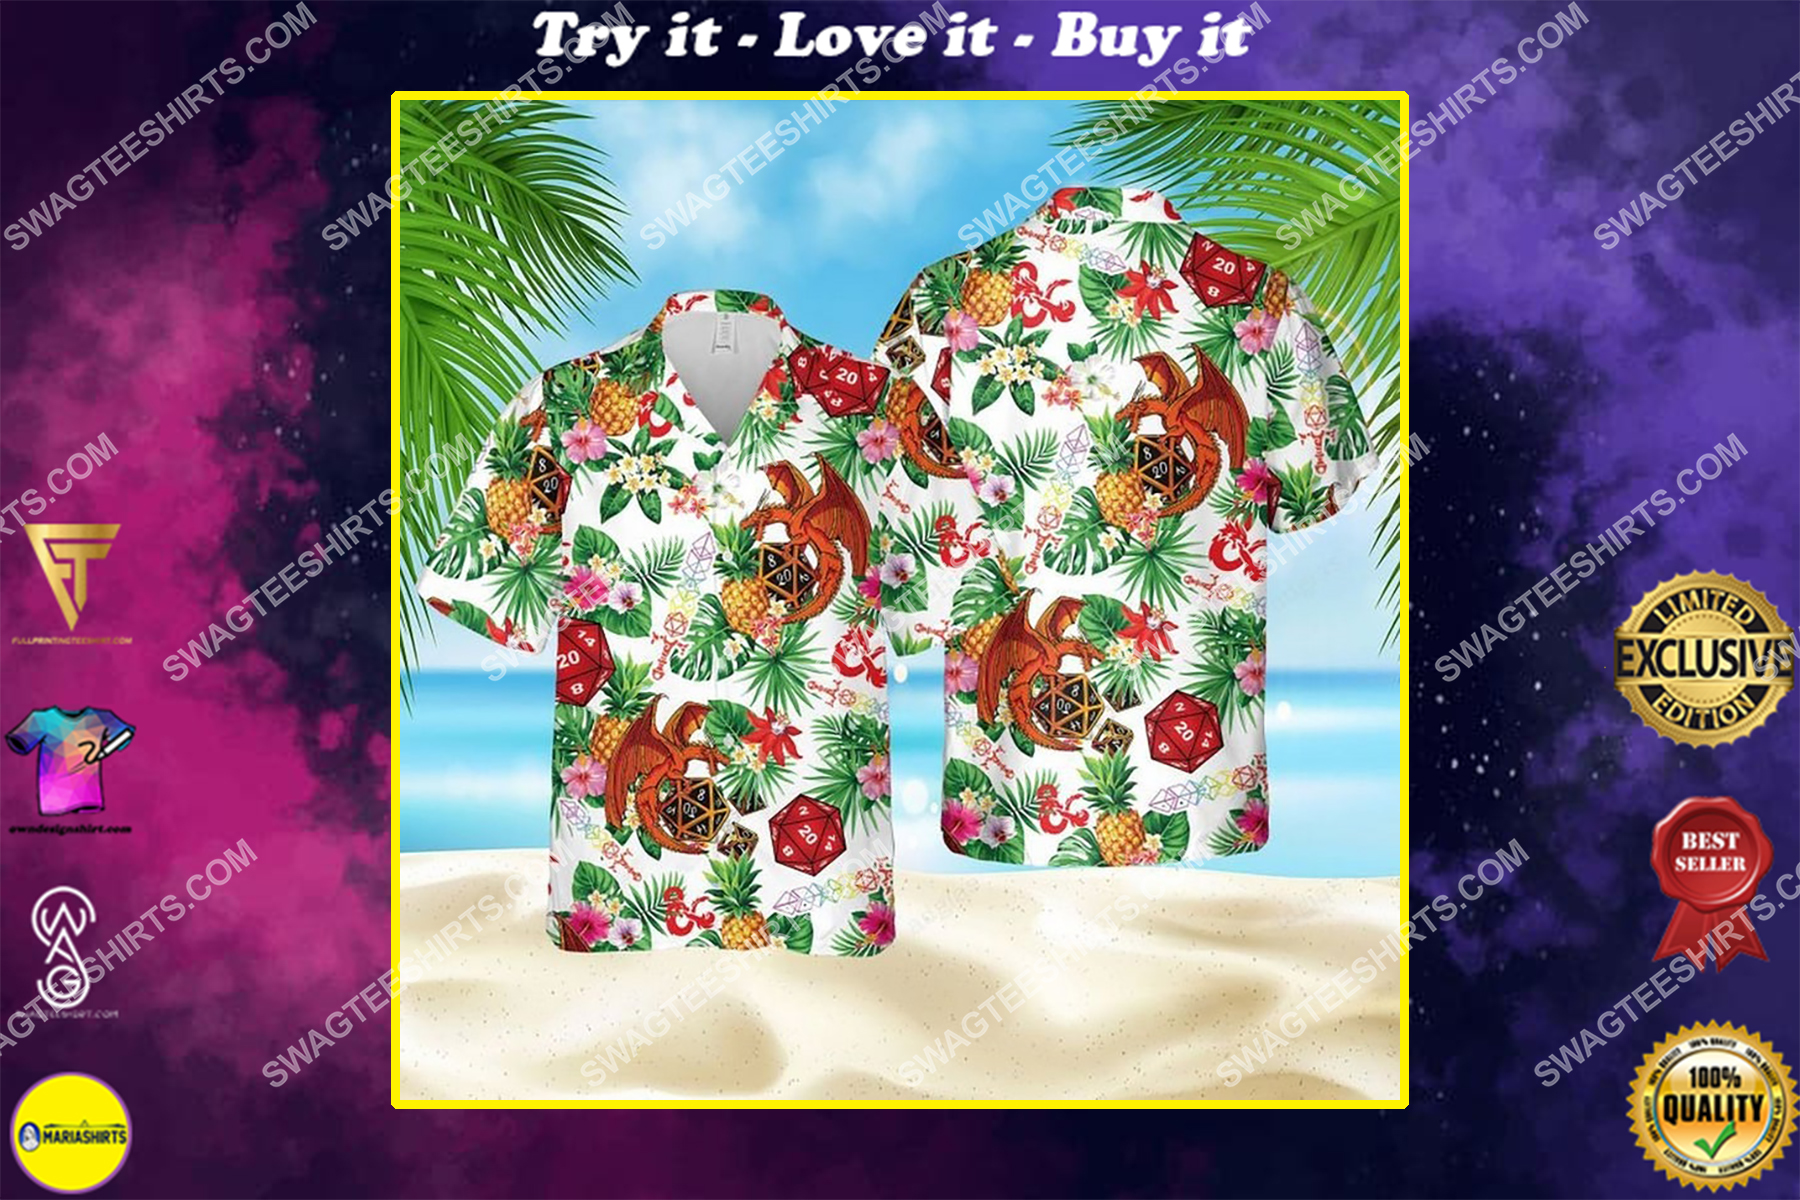 Dice pineapple dragon dice game summer vacation hawaiian shirt